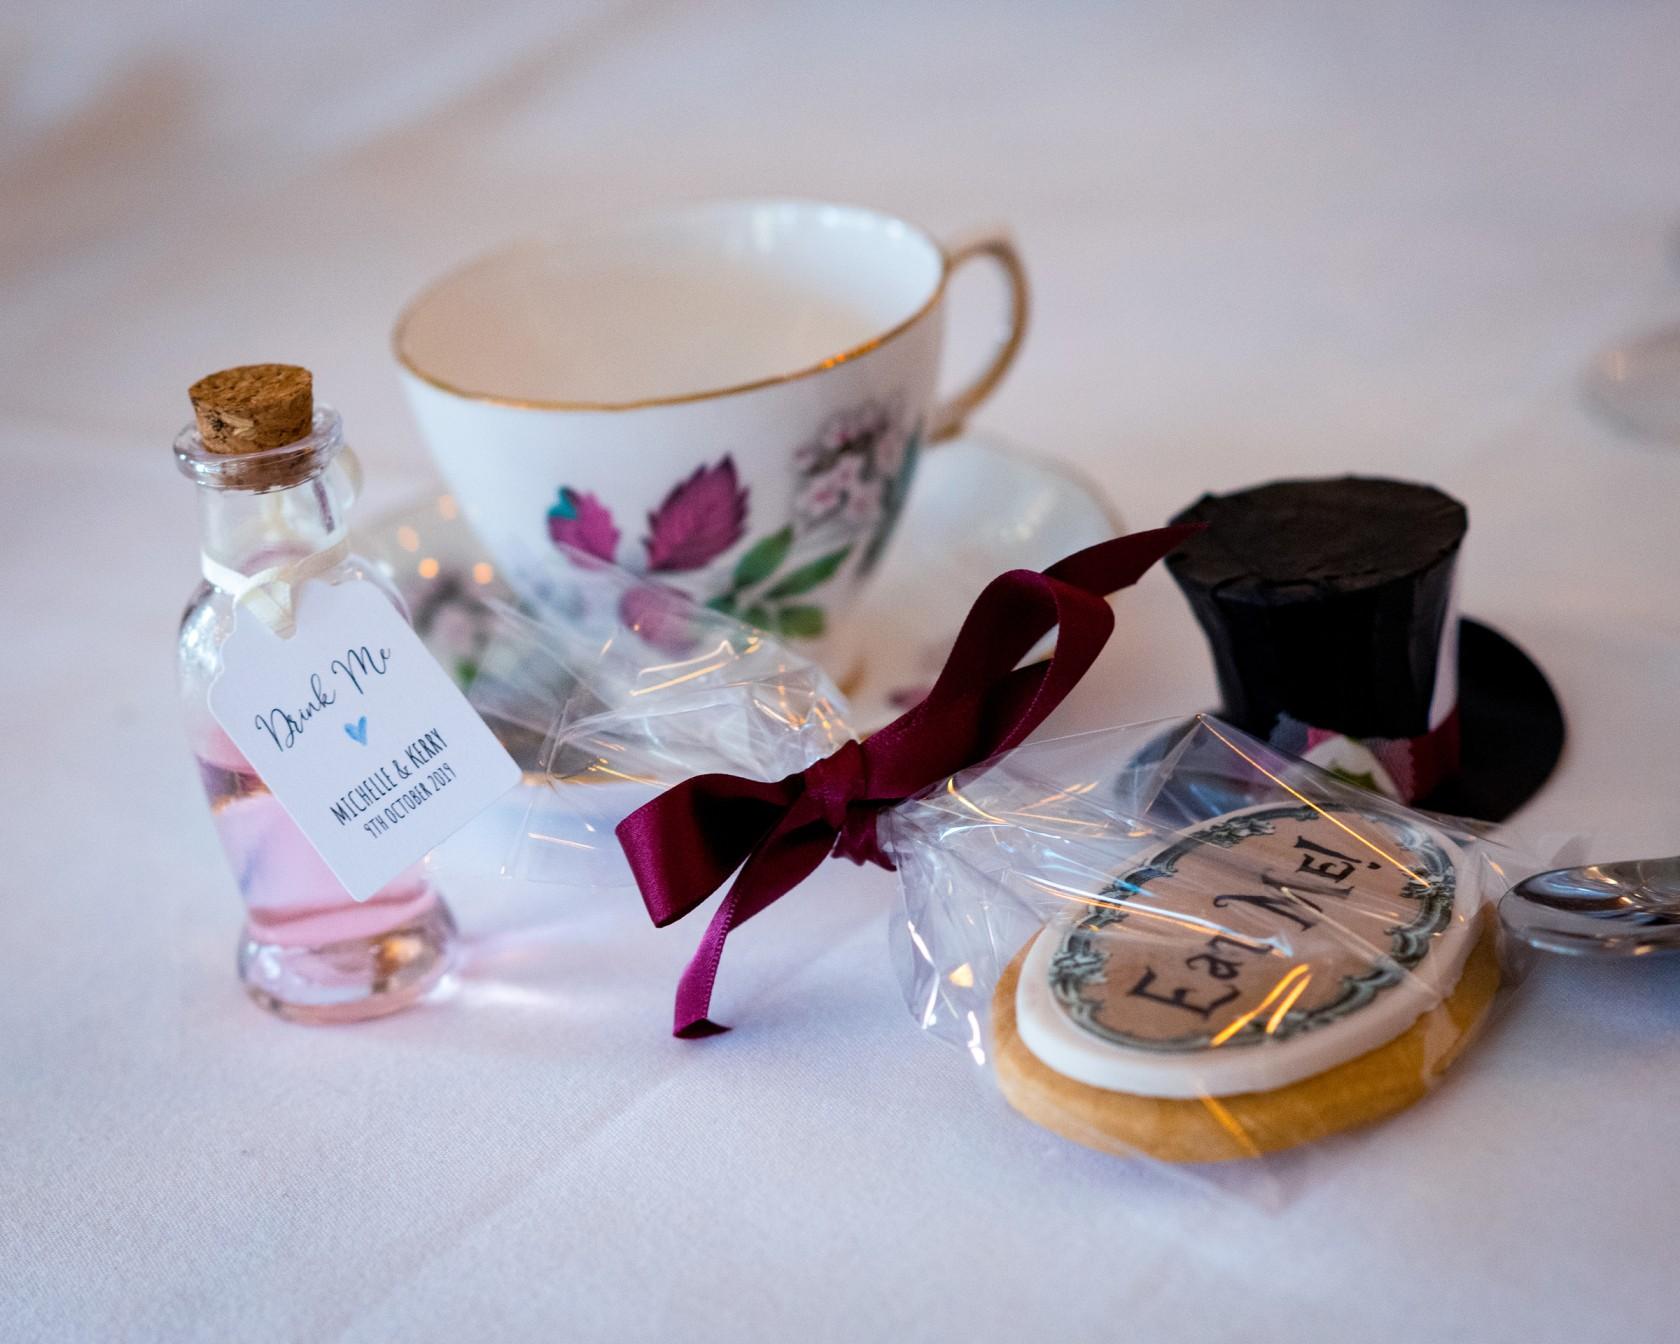 alice in wonderland wedding favours - diy wedding favours - drink me wedding favours